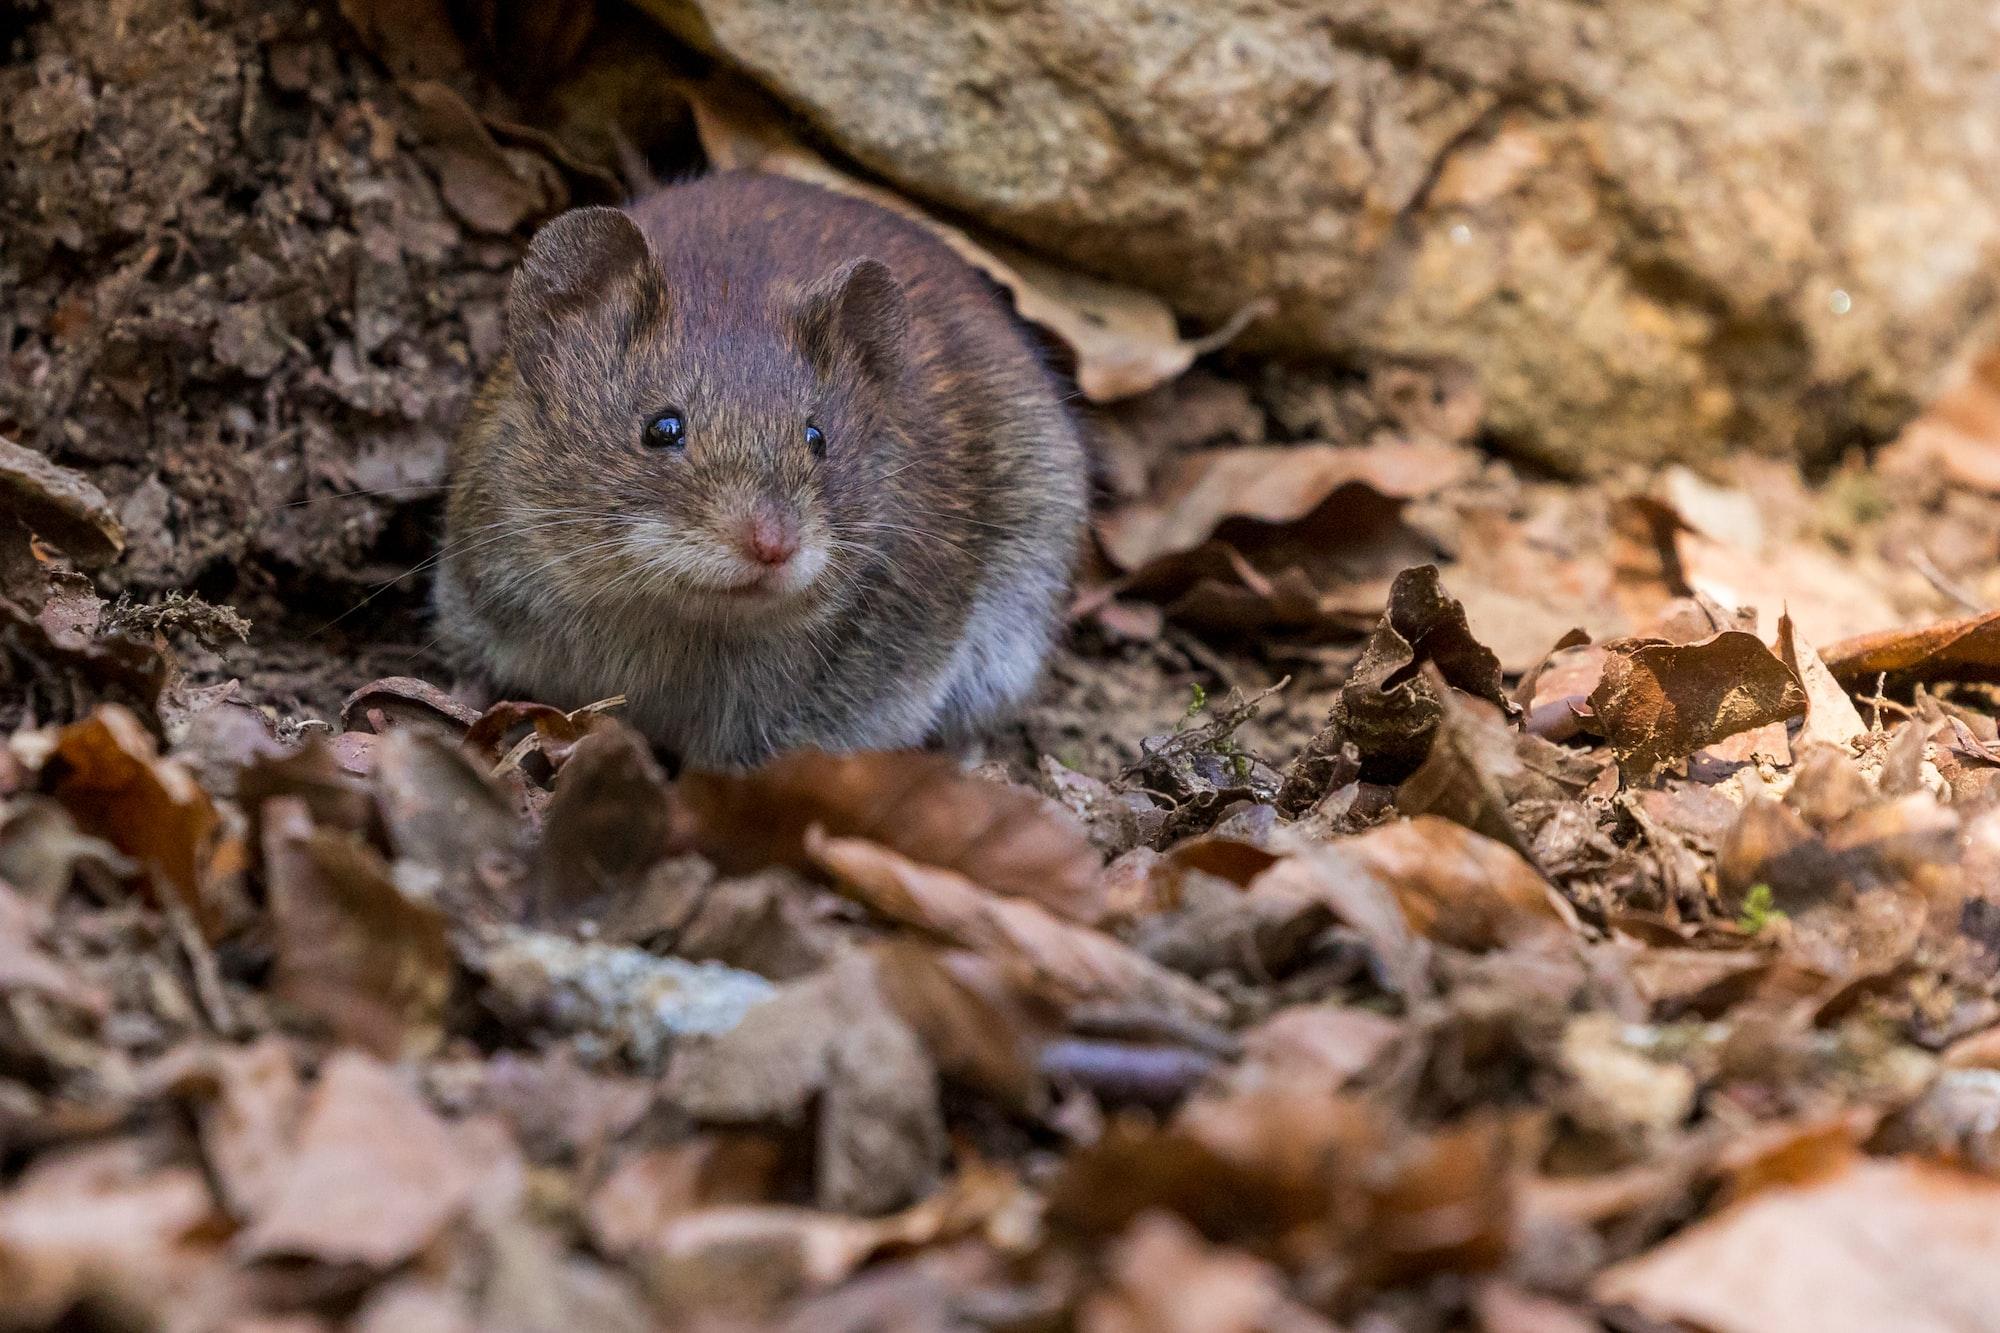 PETA on the Mouse Plague